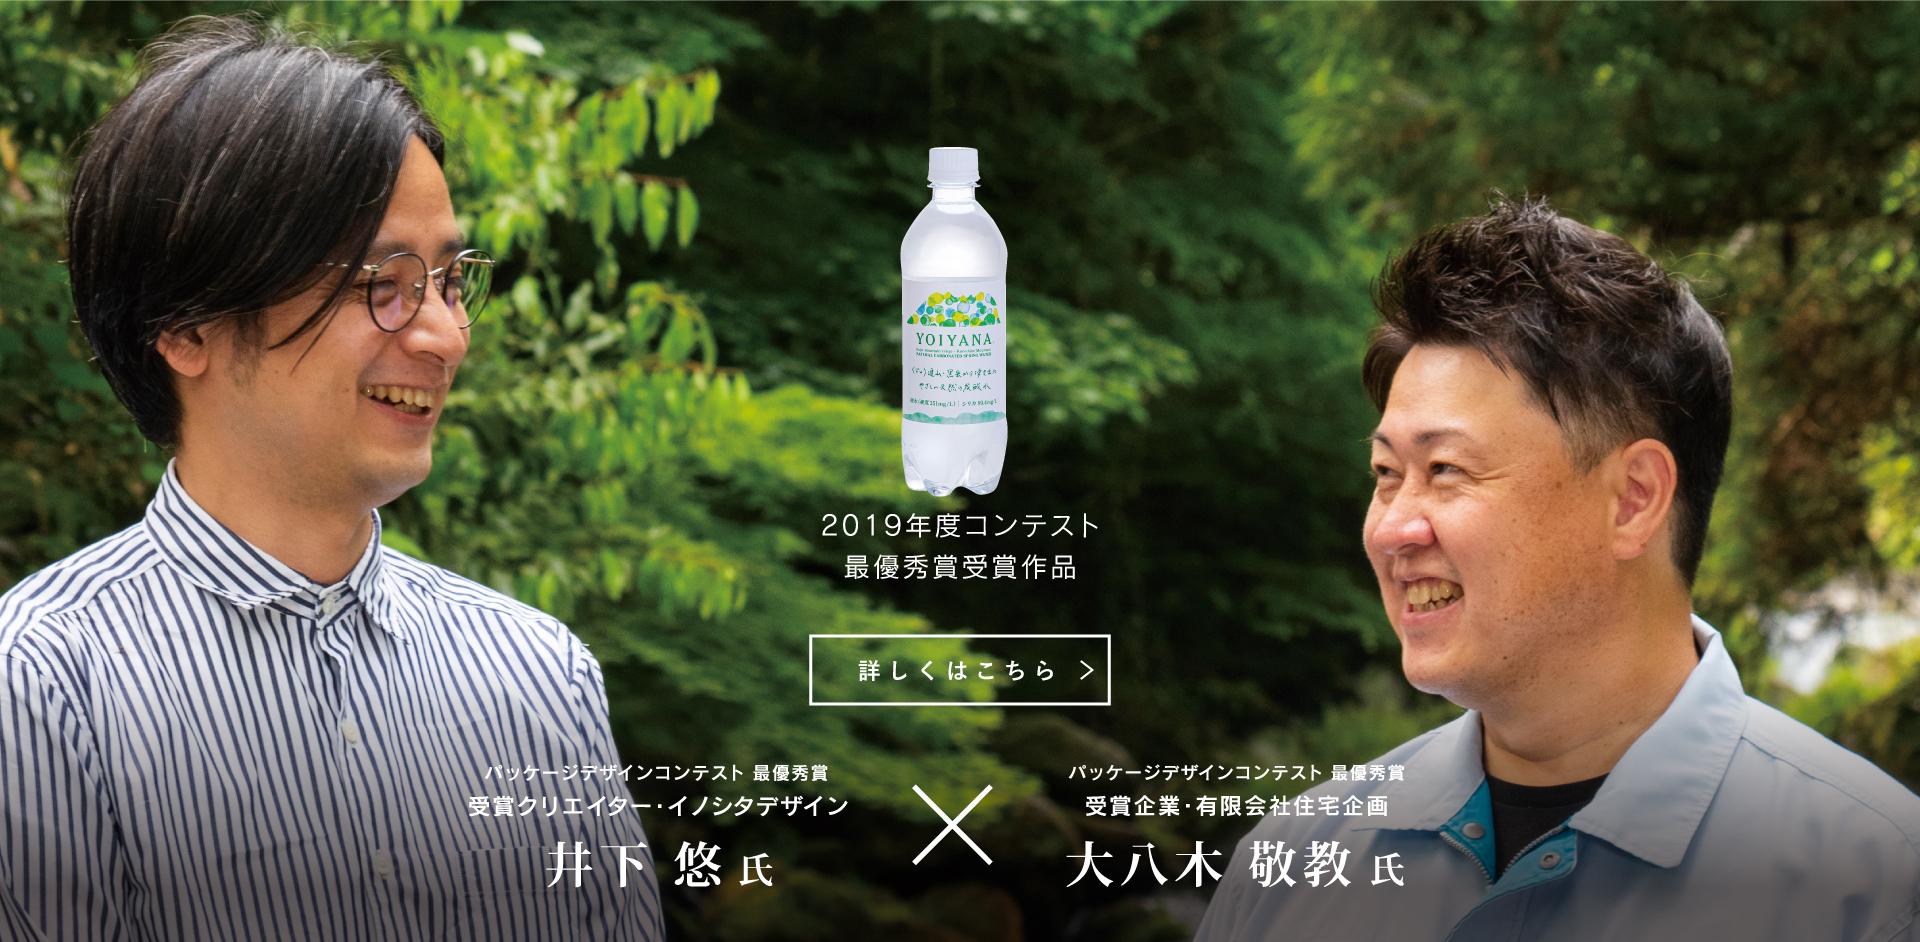 2019年度コンテスト対談 井下 悠 氏 大八木 敬教 氏